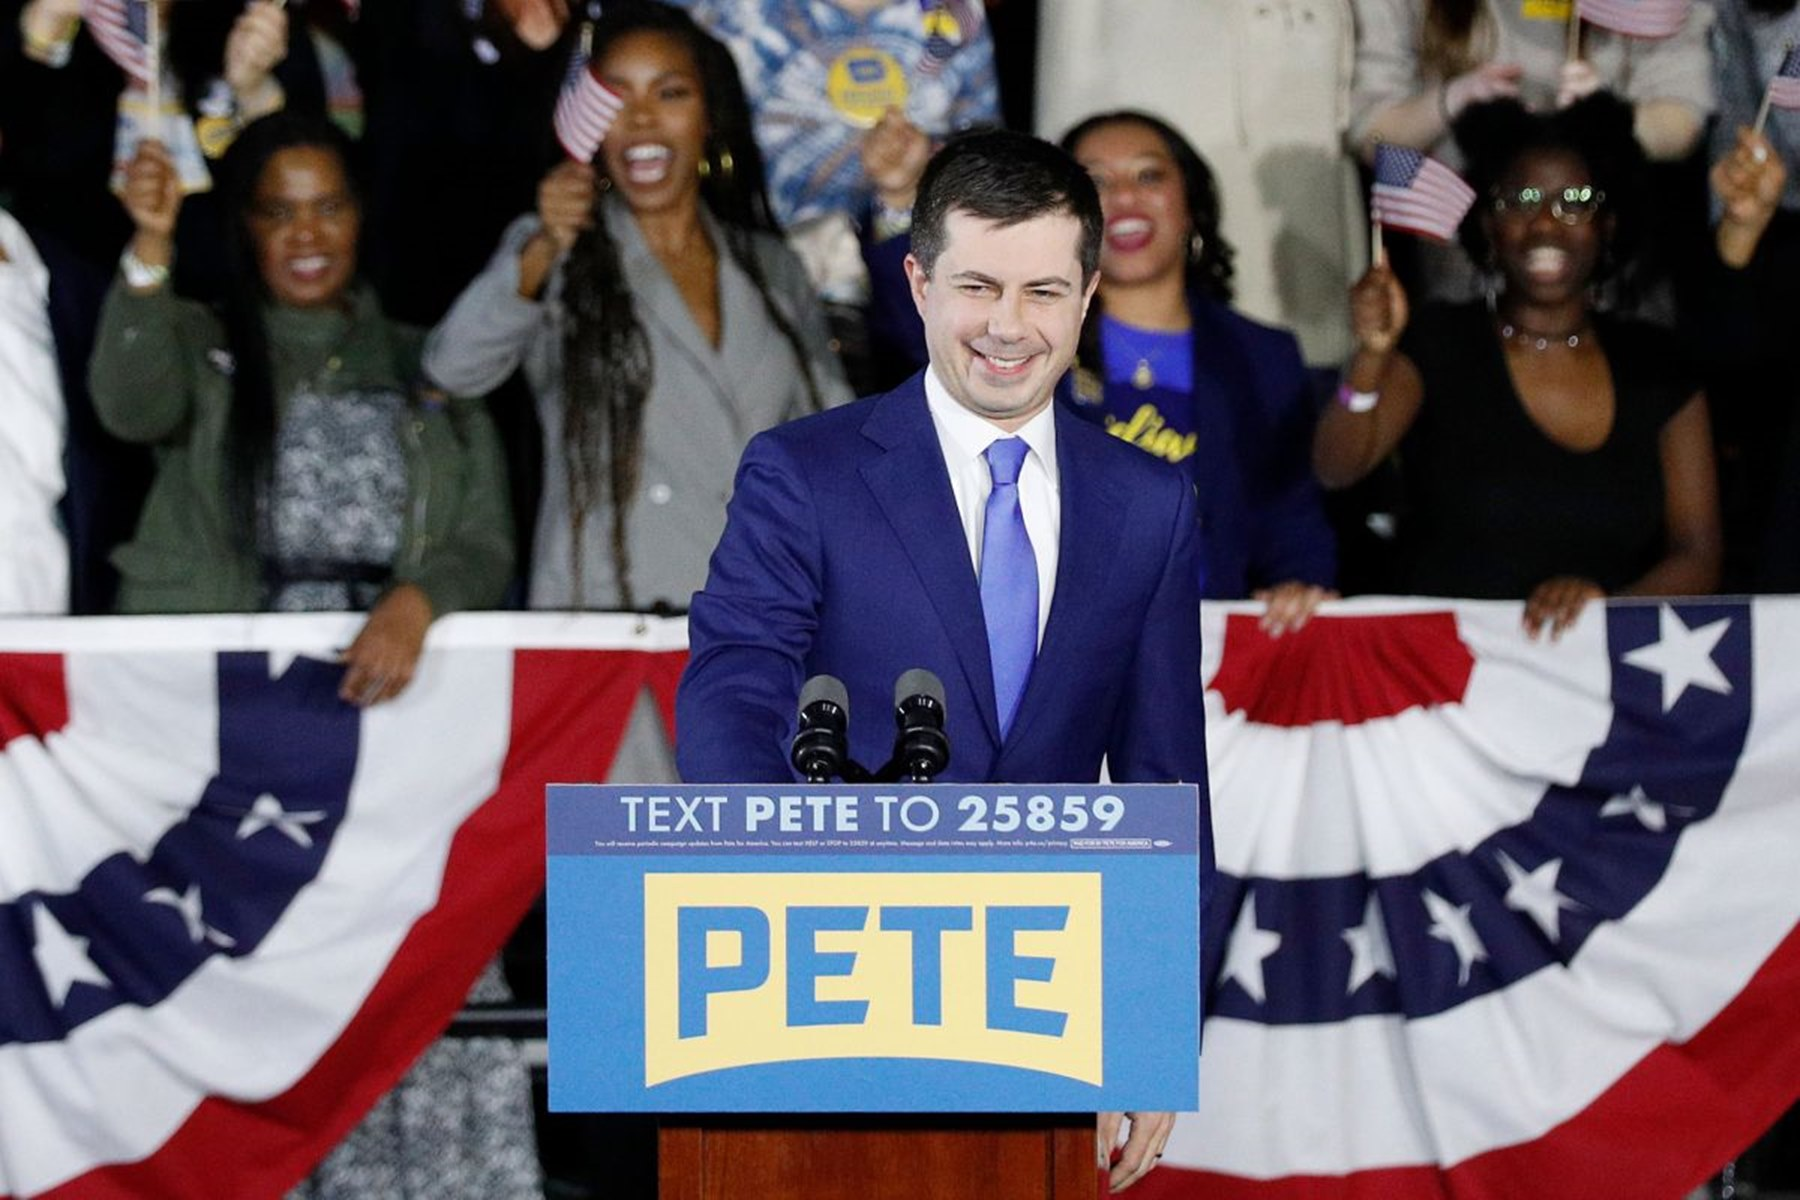 Pete Buttigieg Iowa Caucuses Bernie Sanders